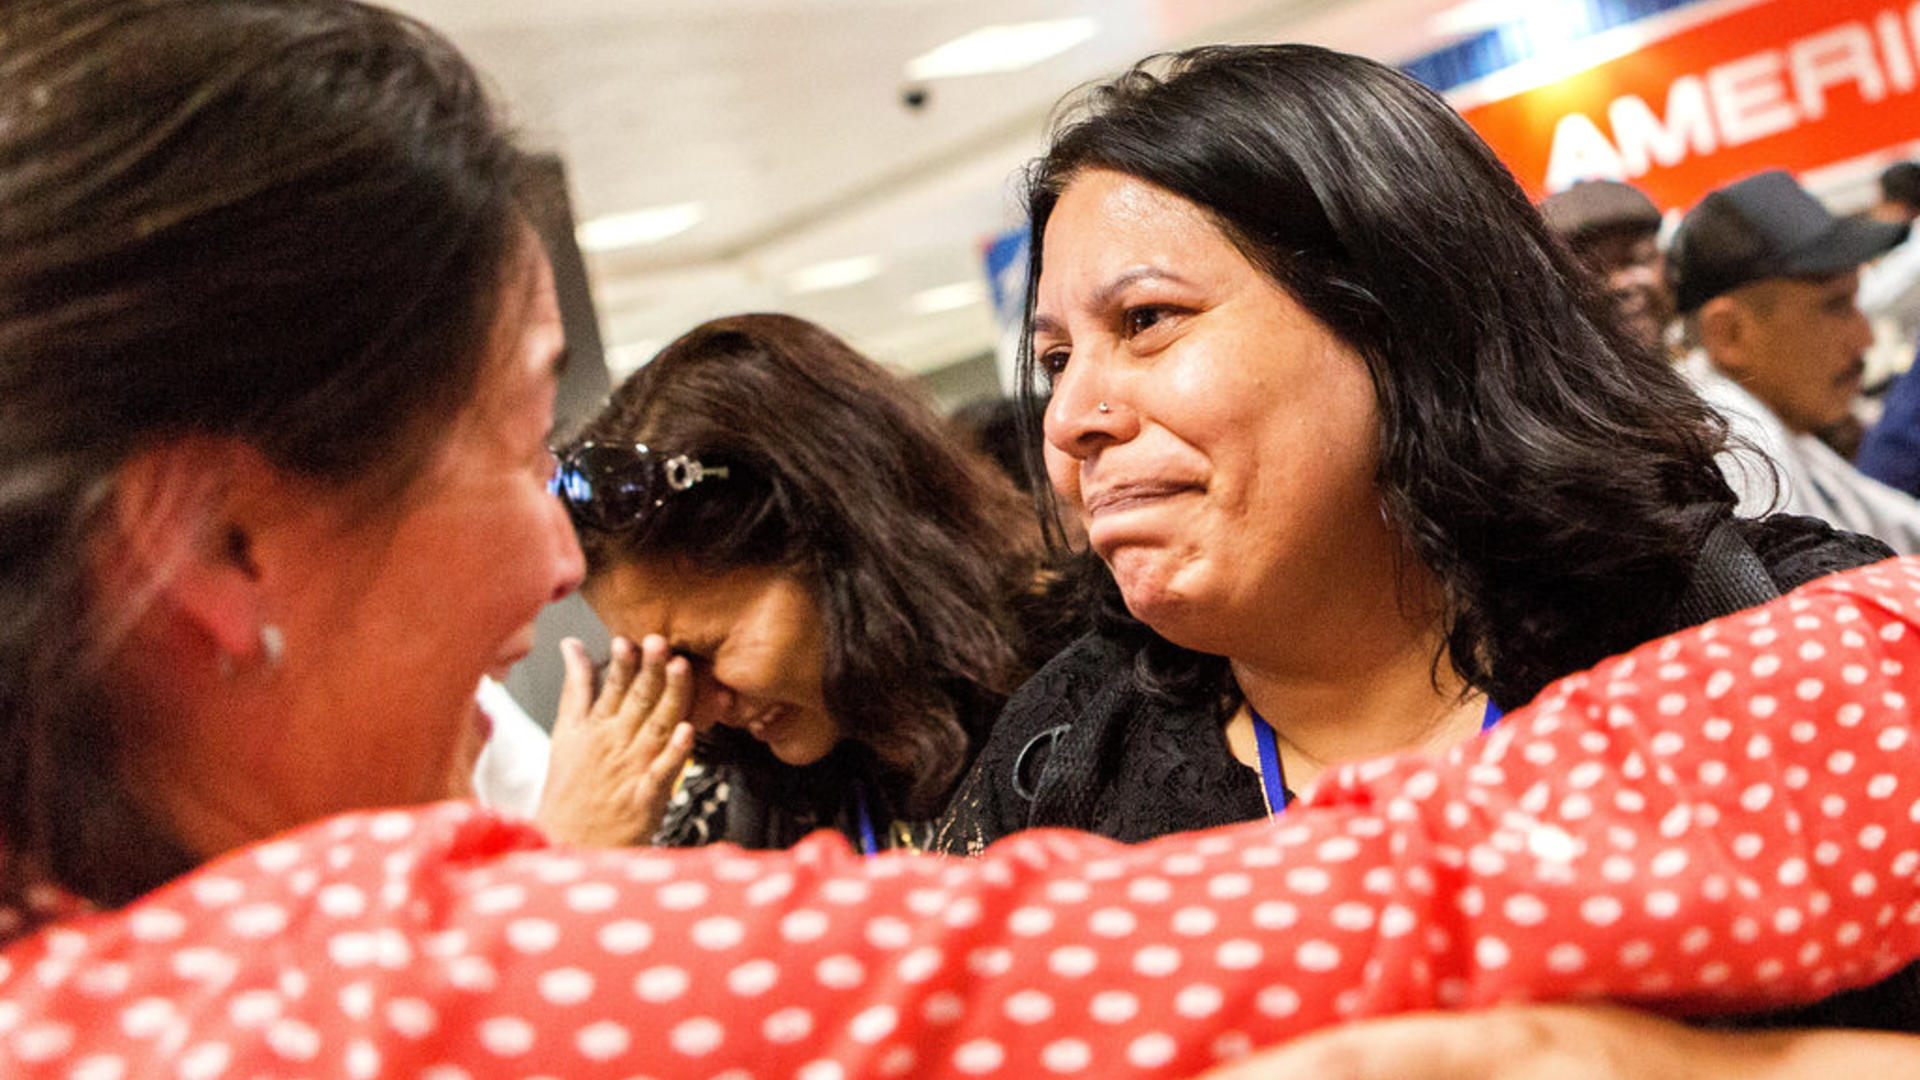 IRC staffer Kristin welcomes Shaista Sadiq at Dulles airport with a hug